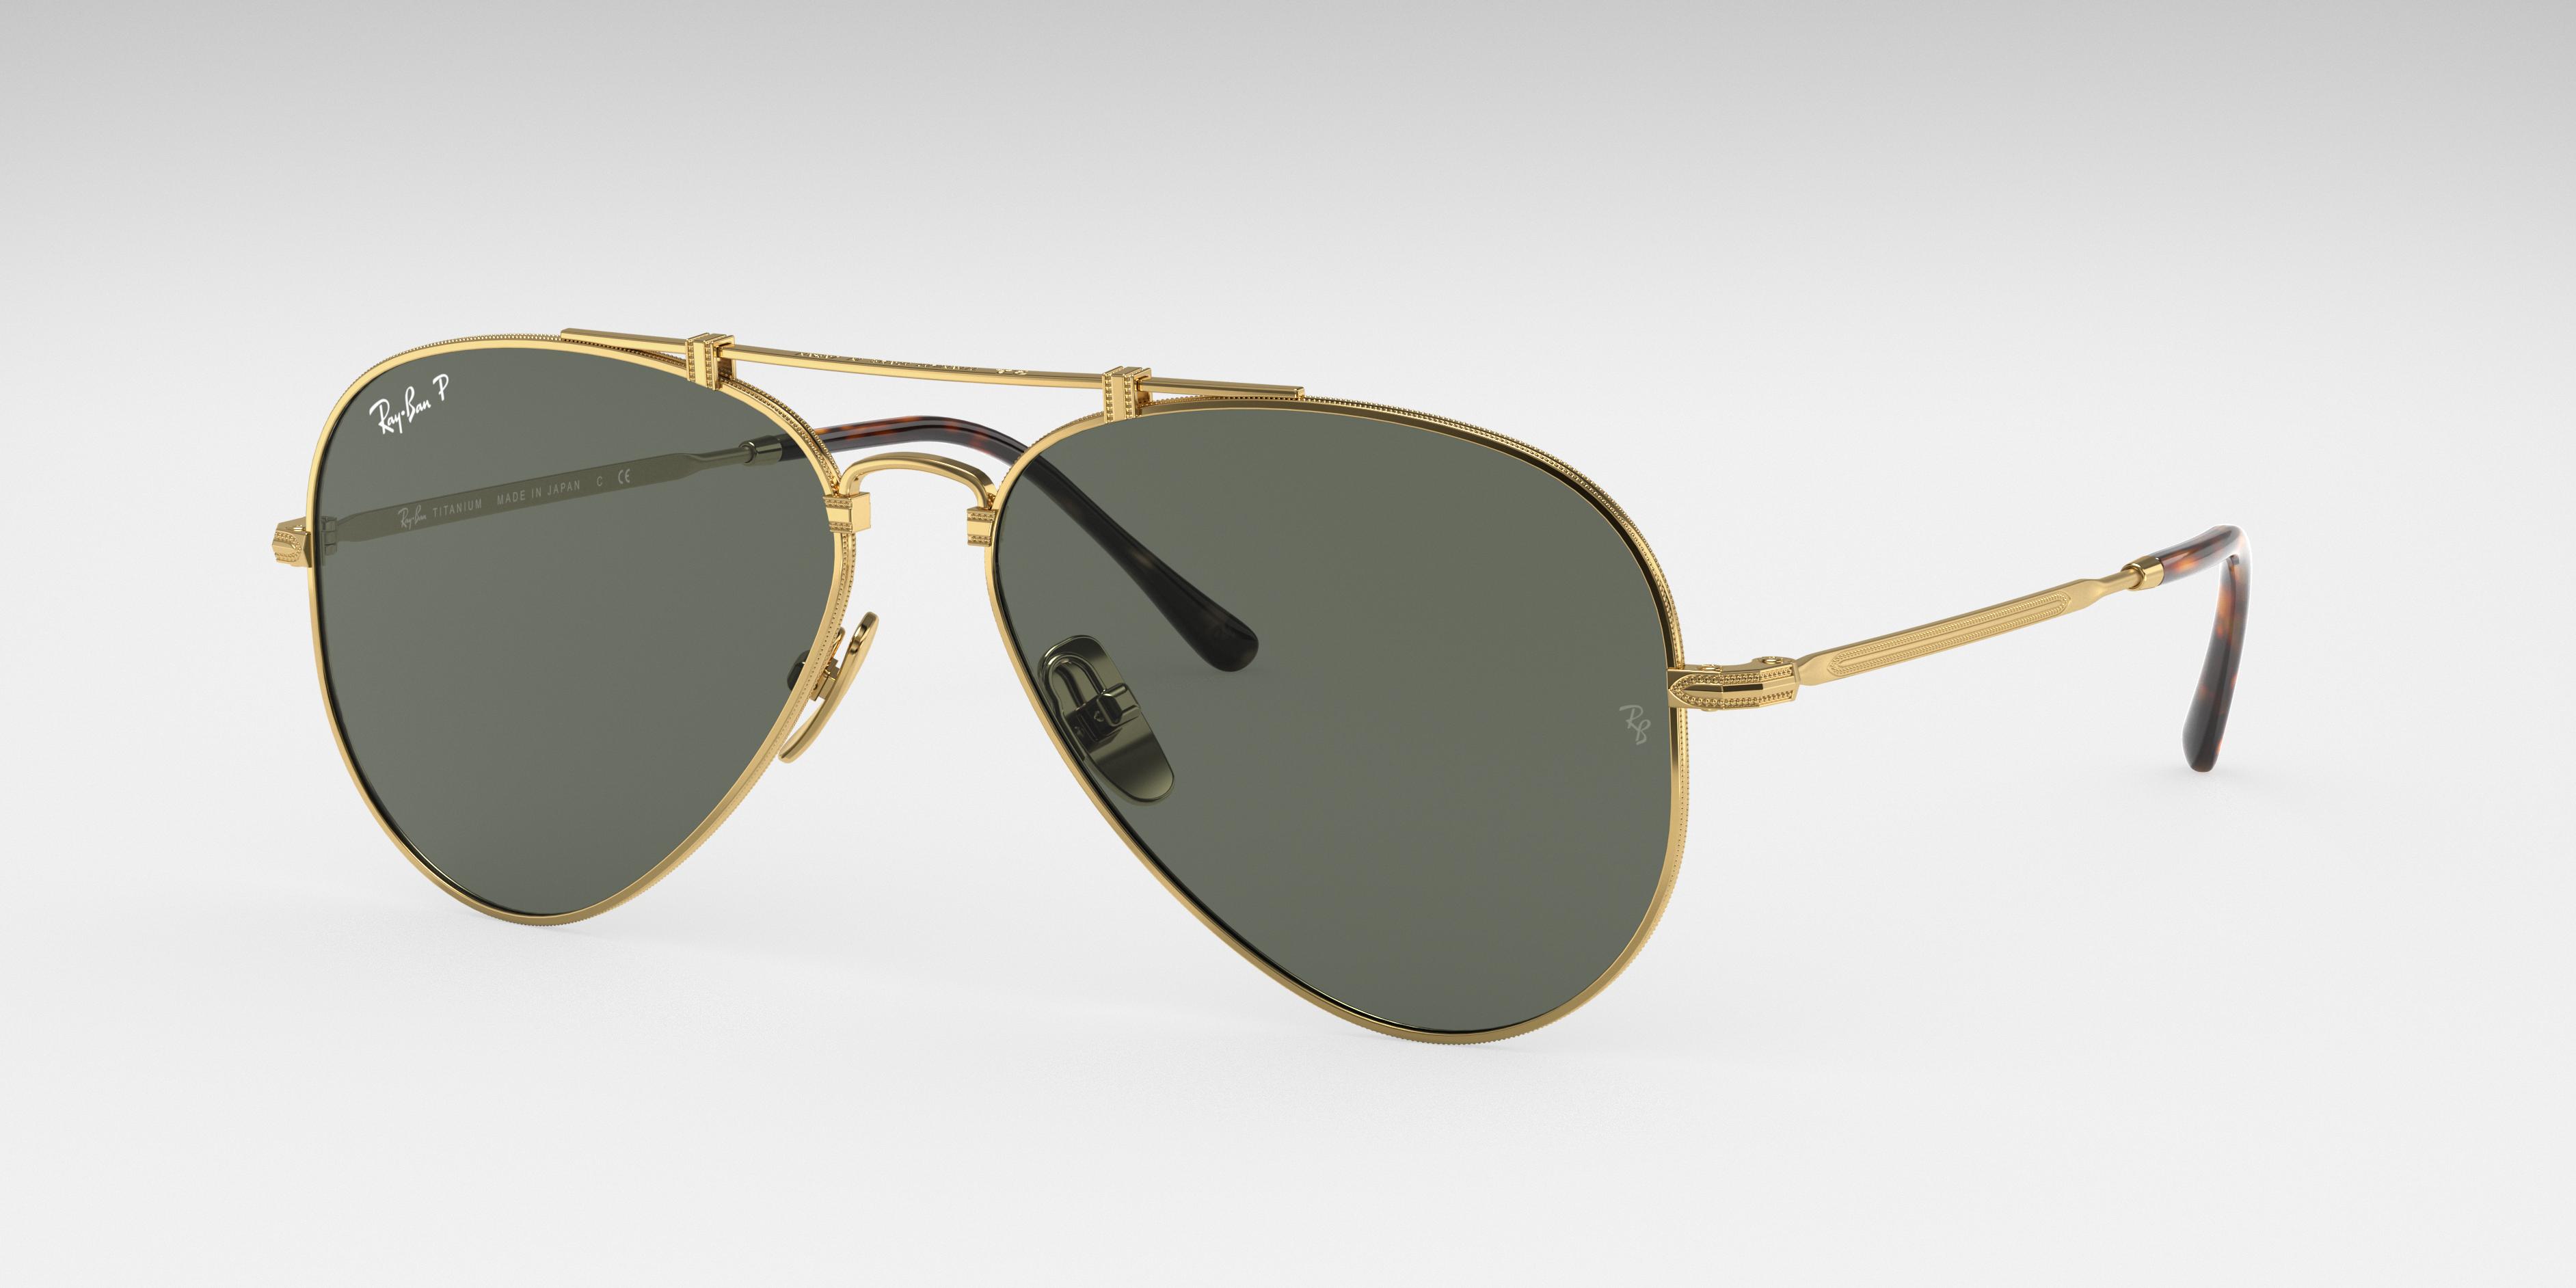 Ray-Ban Aviator Titanium Gold, Polarized Green Lenses - RB8125M